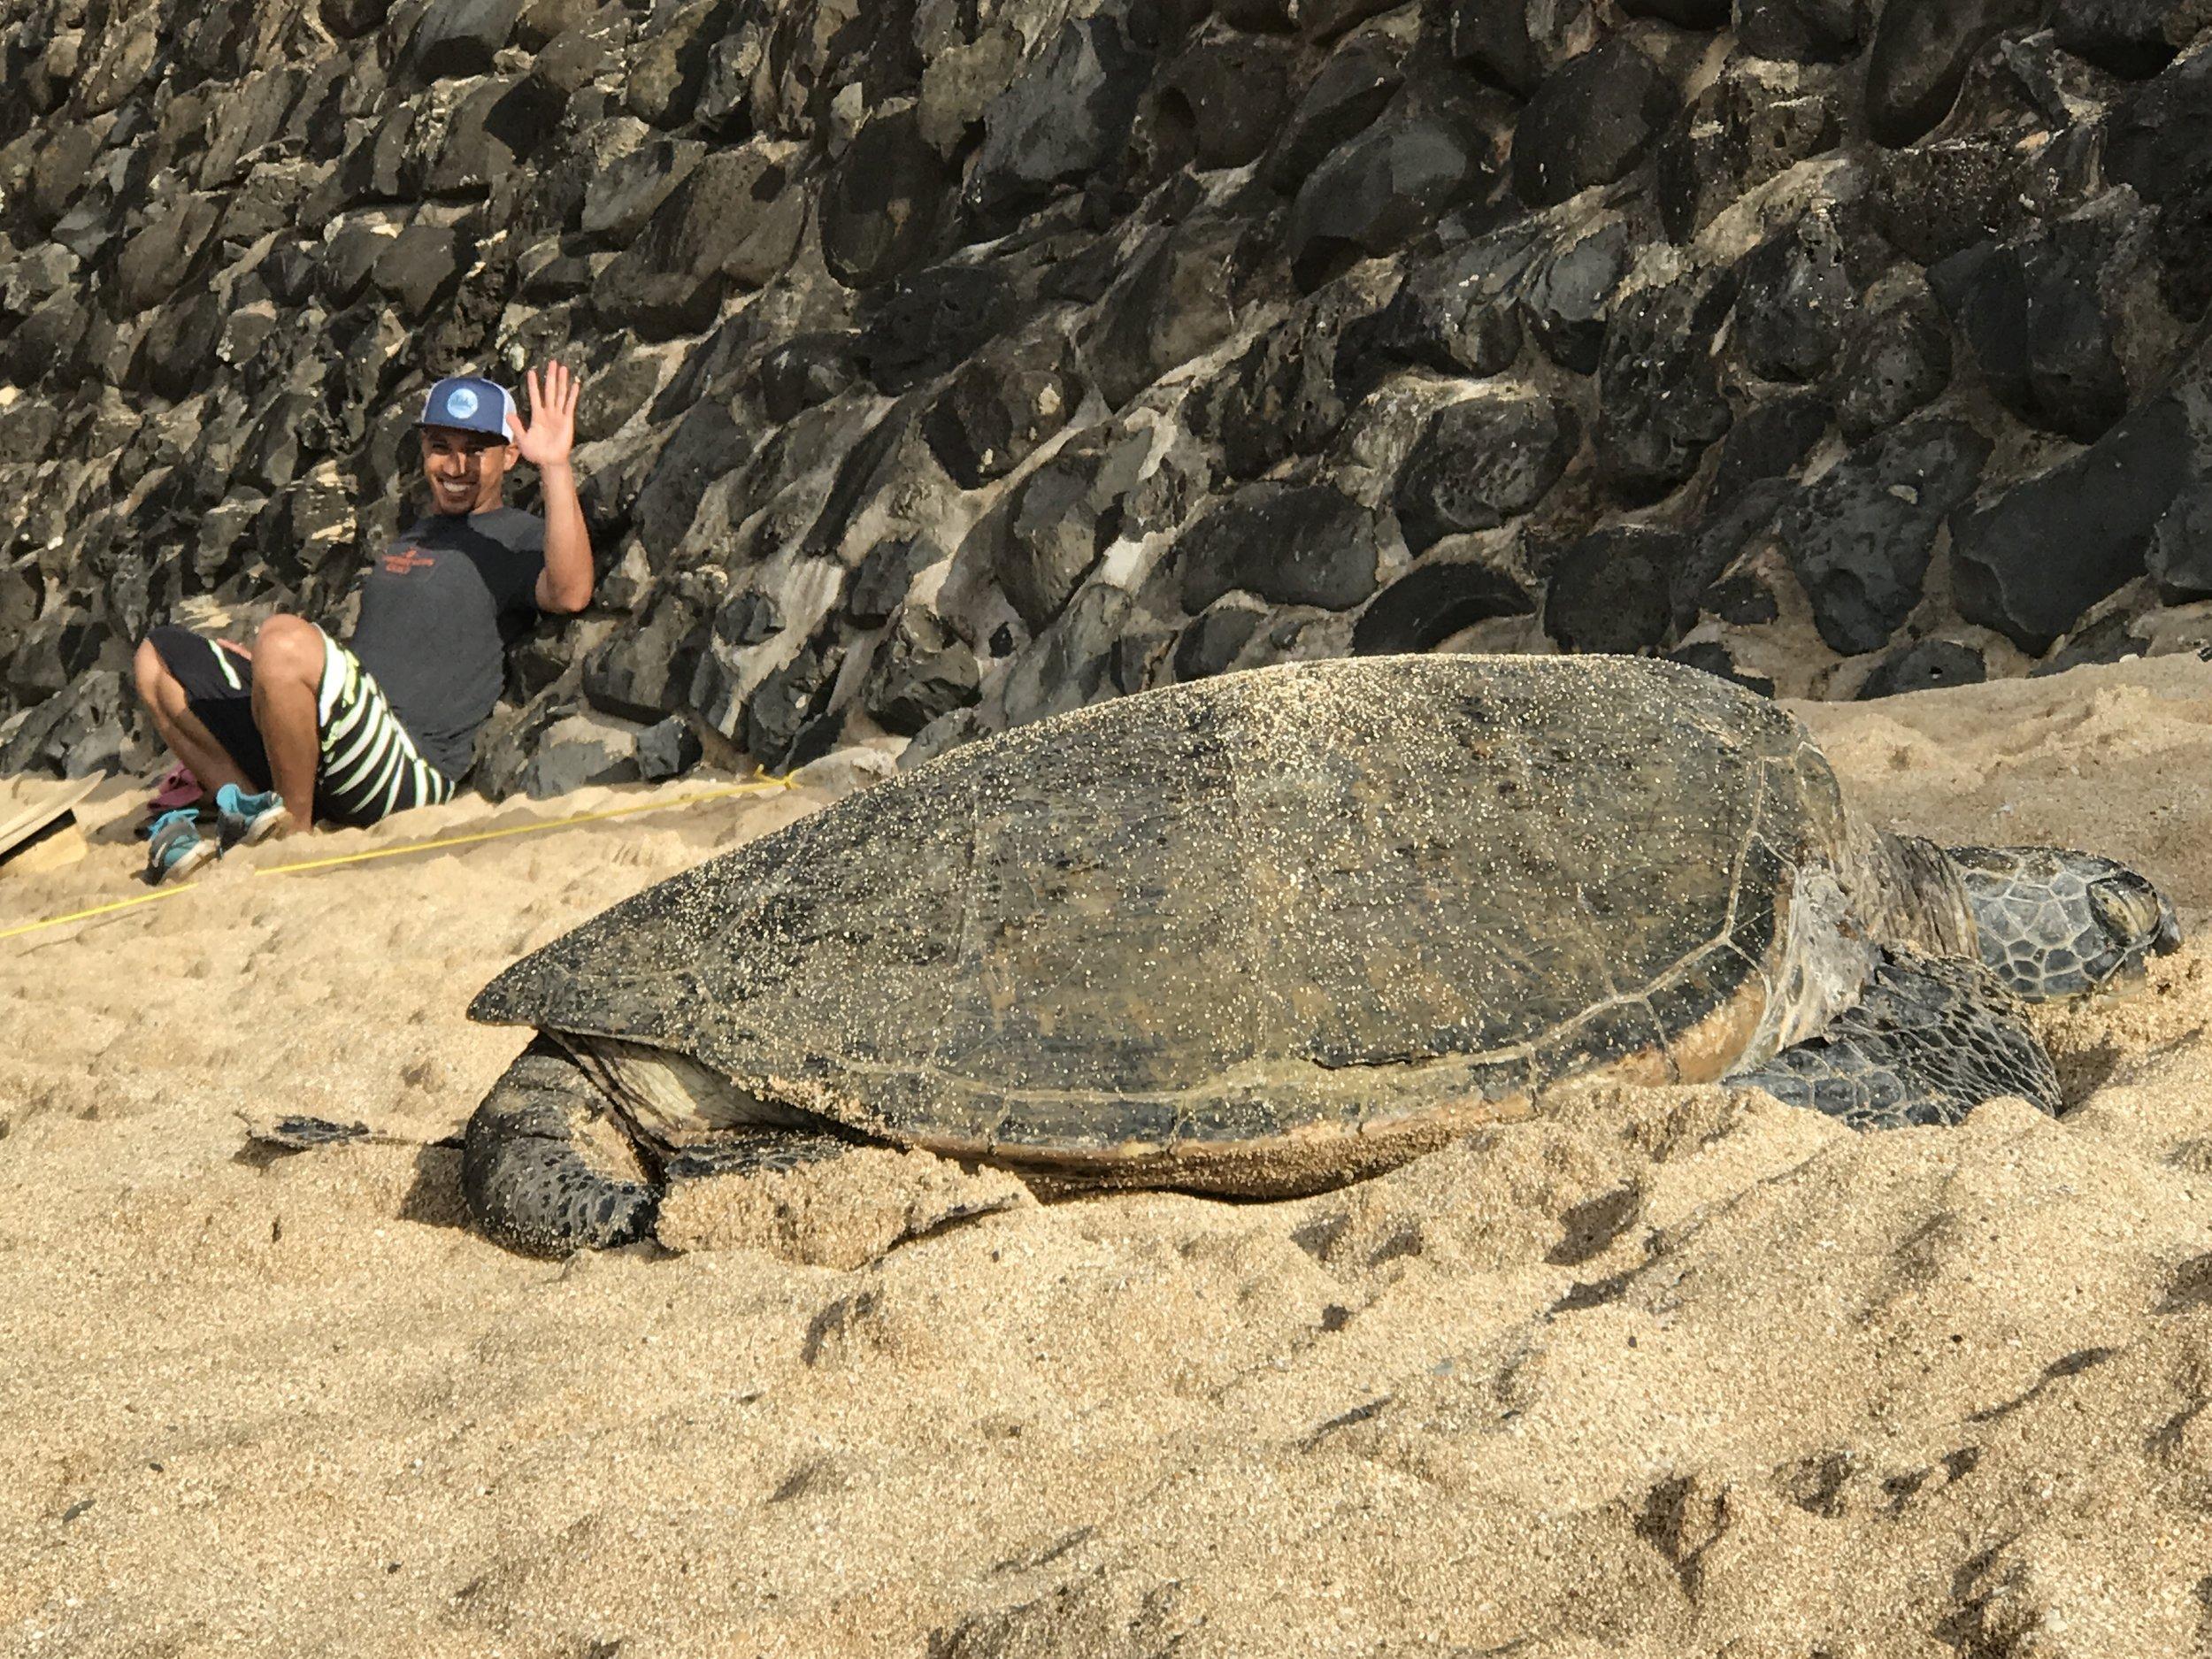 sea turtle views maui things to do